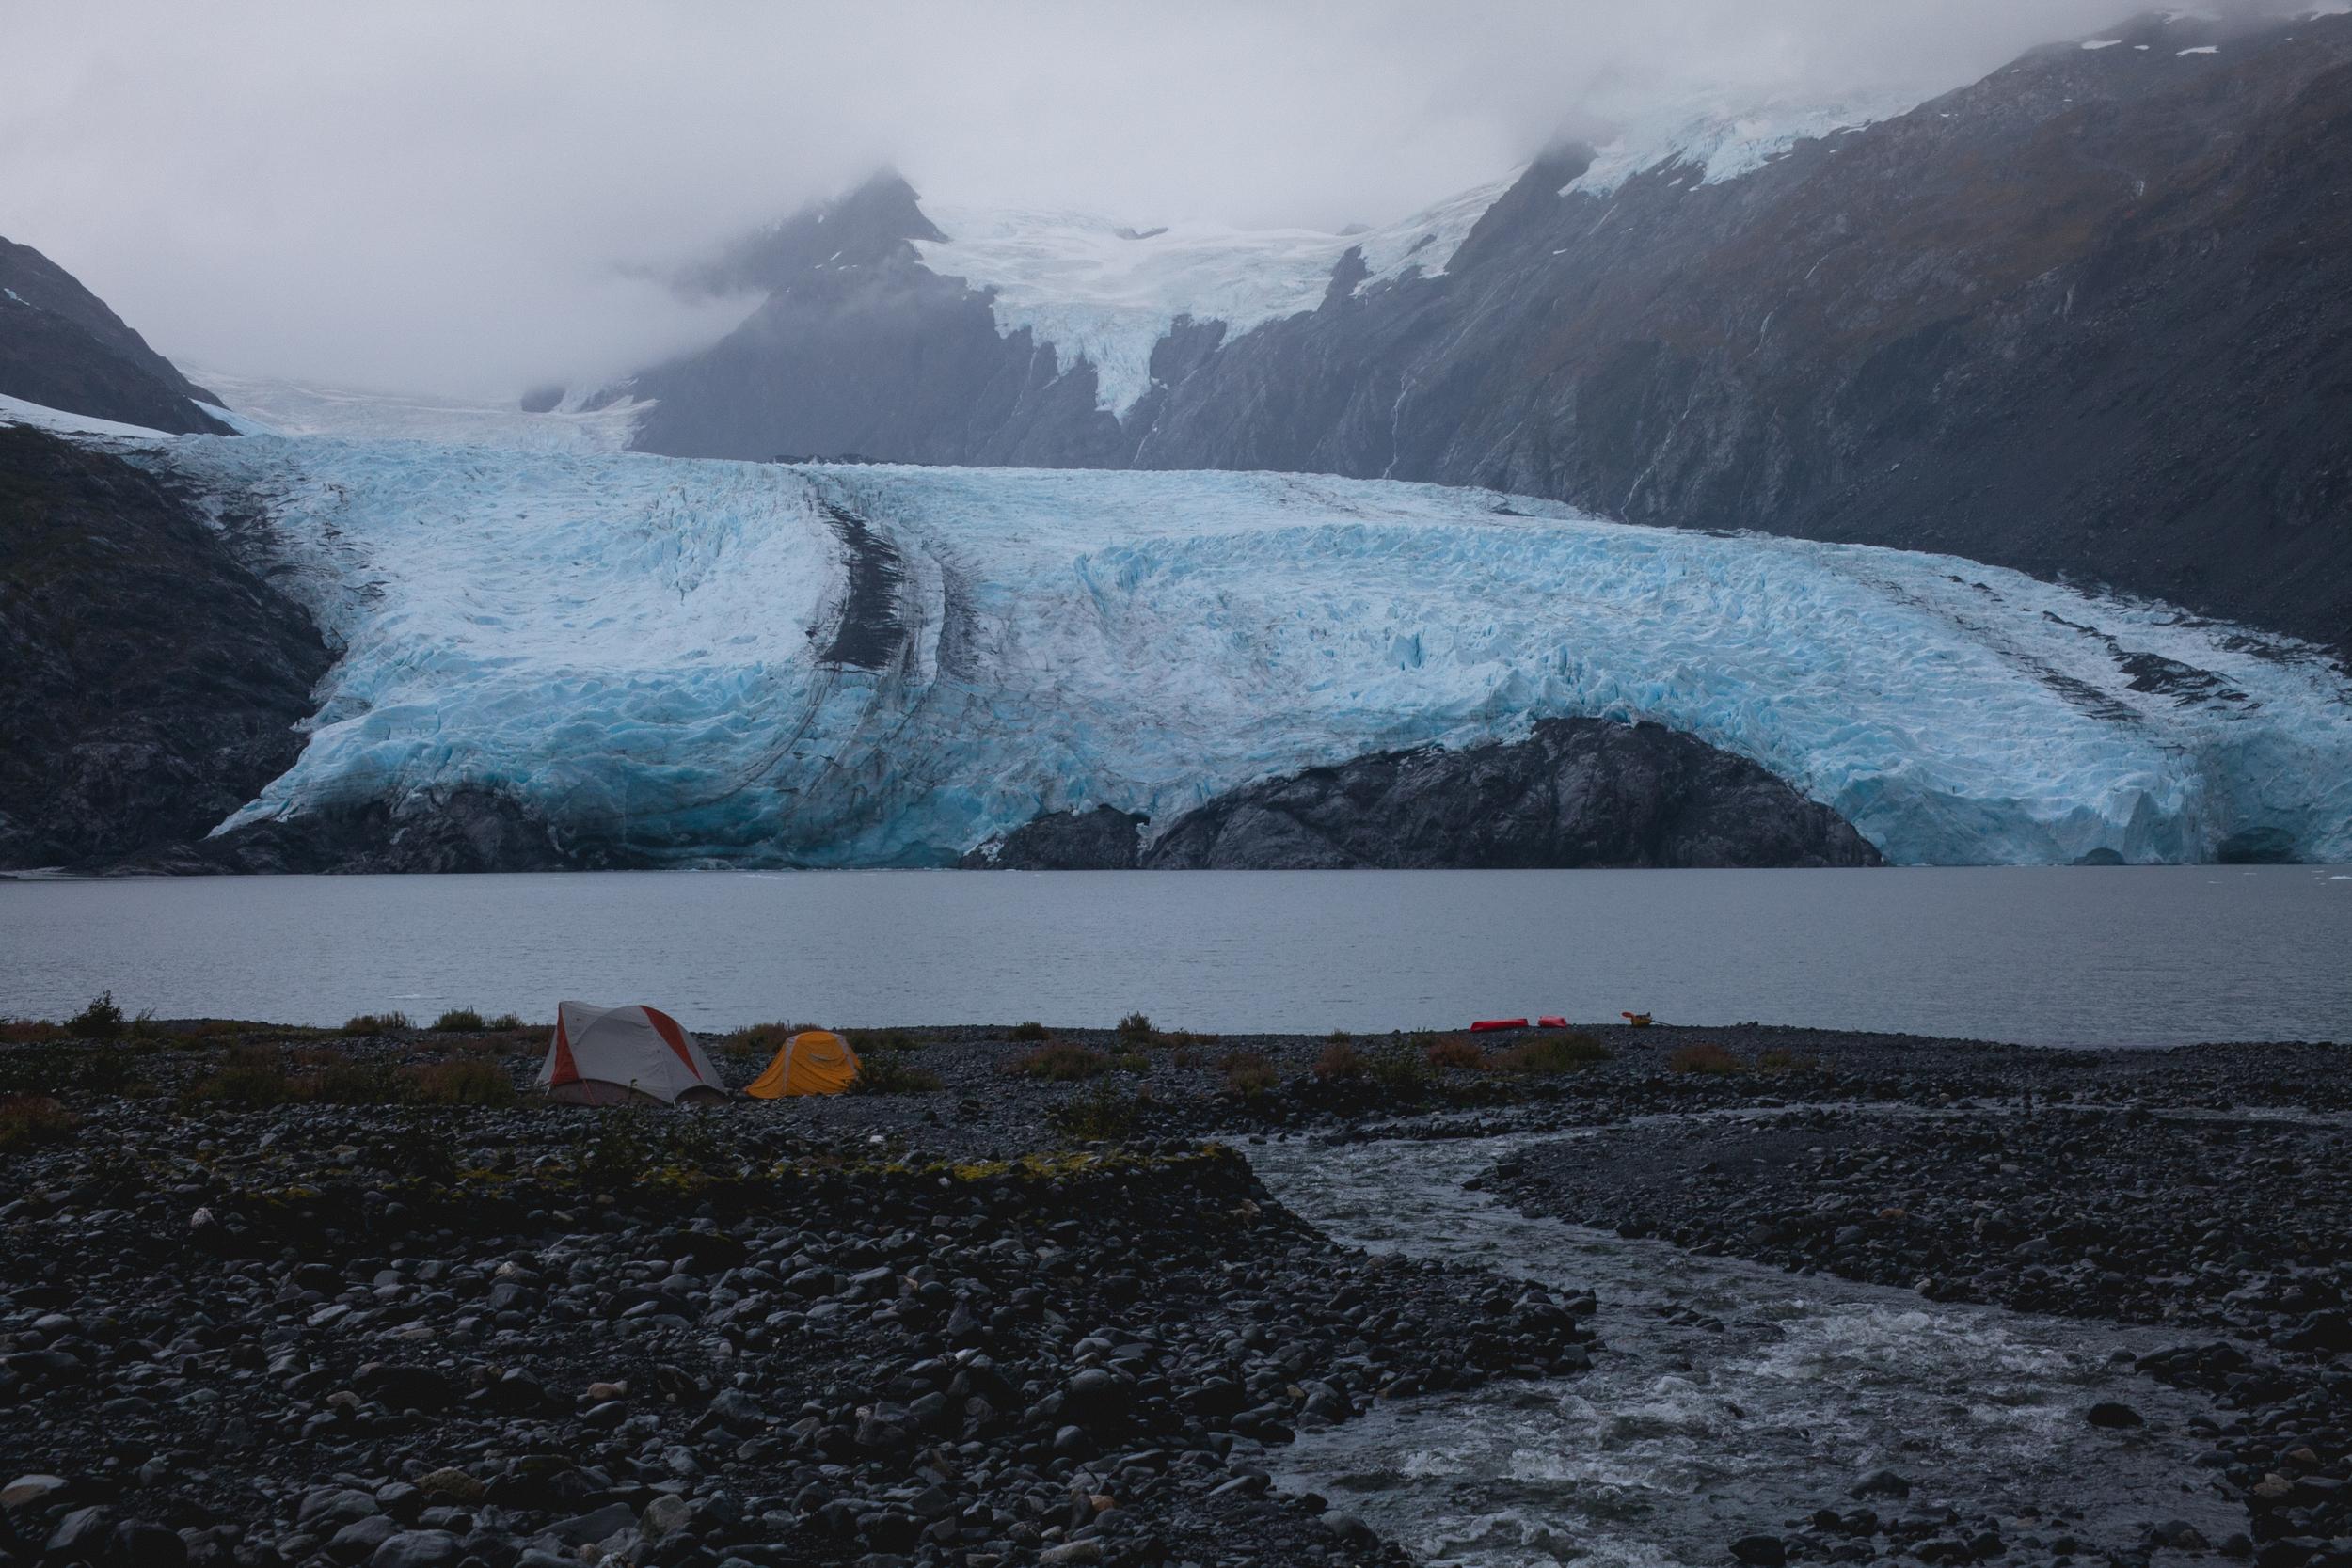 portage glacier alaska kayak camping